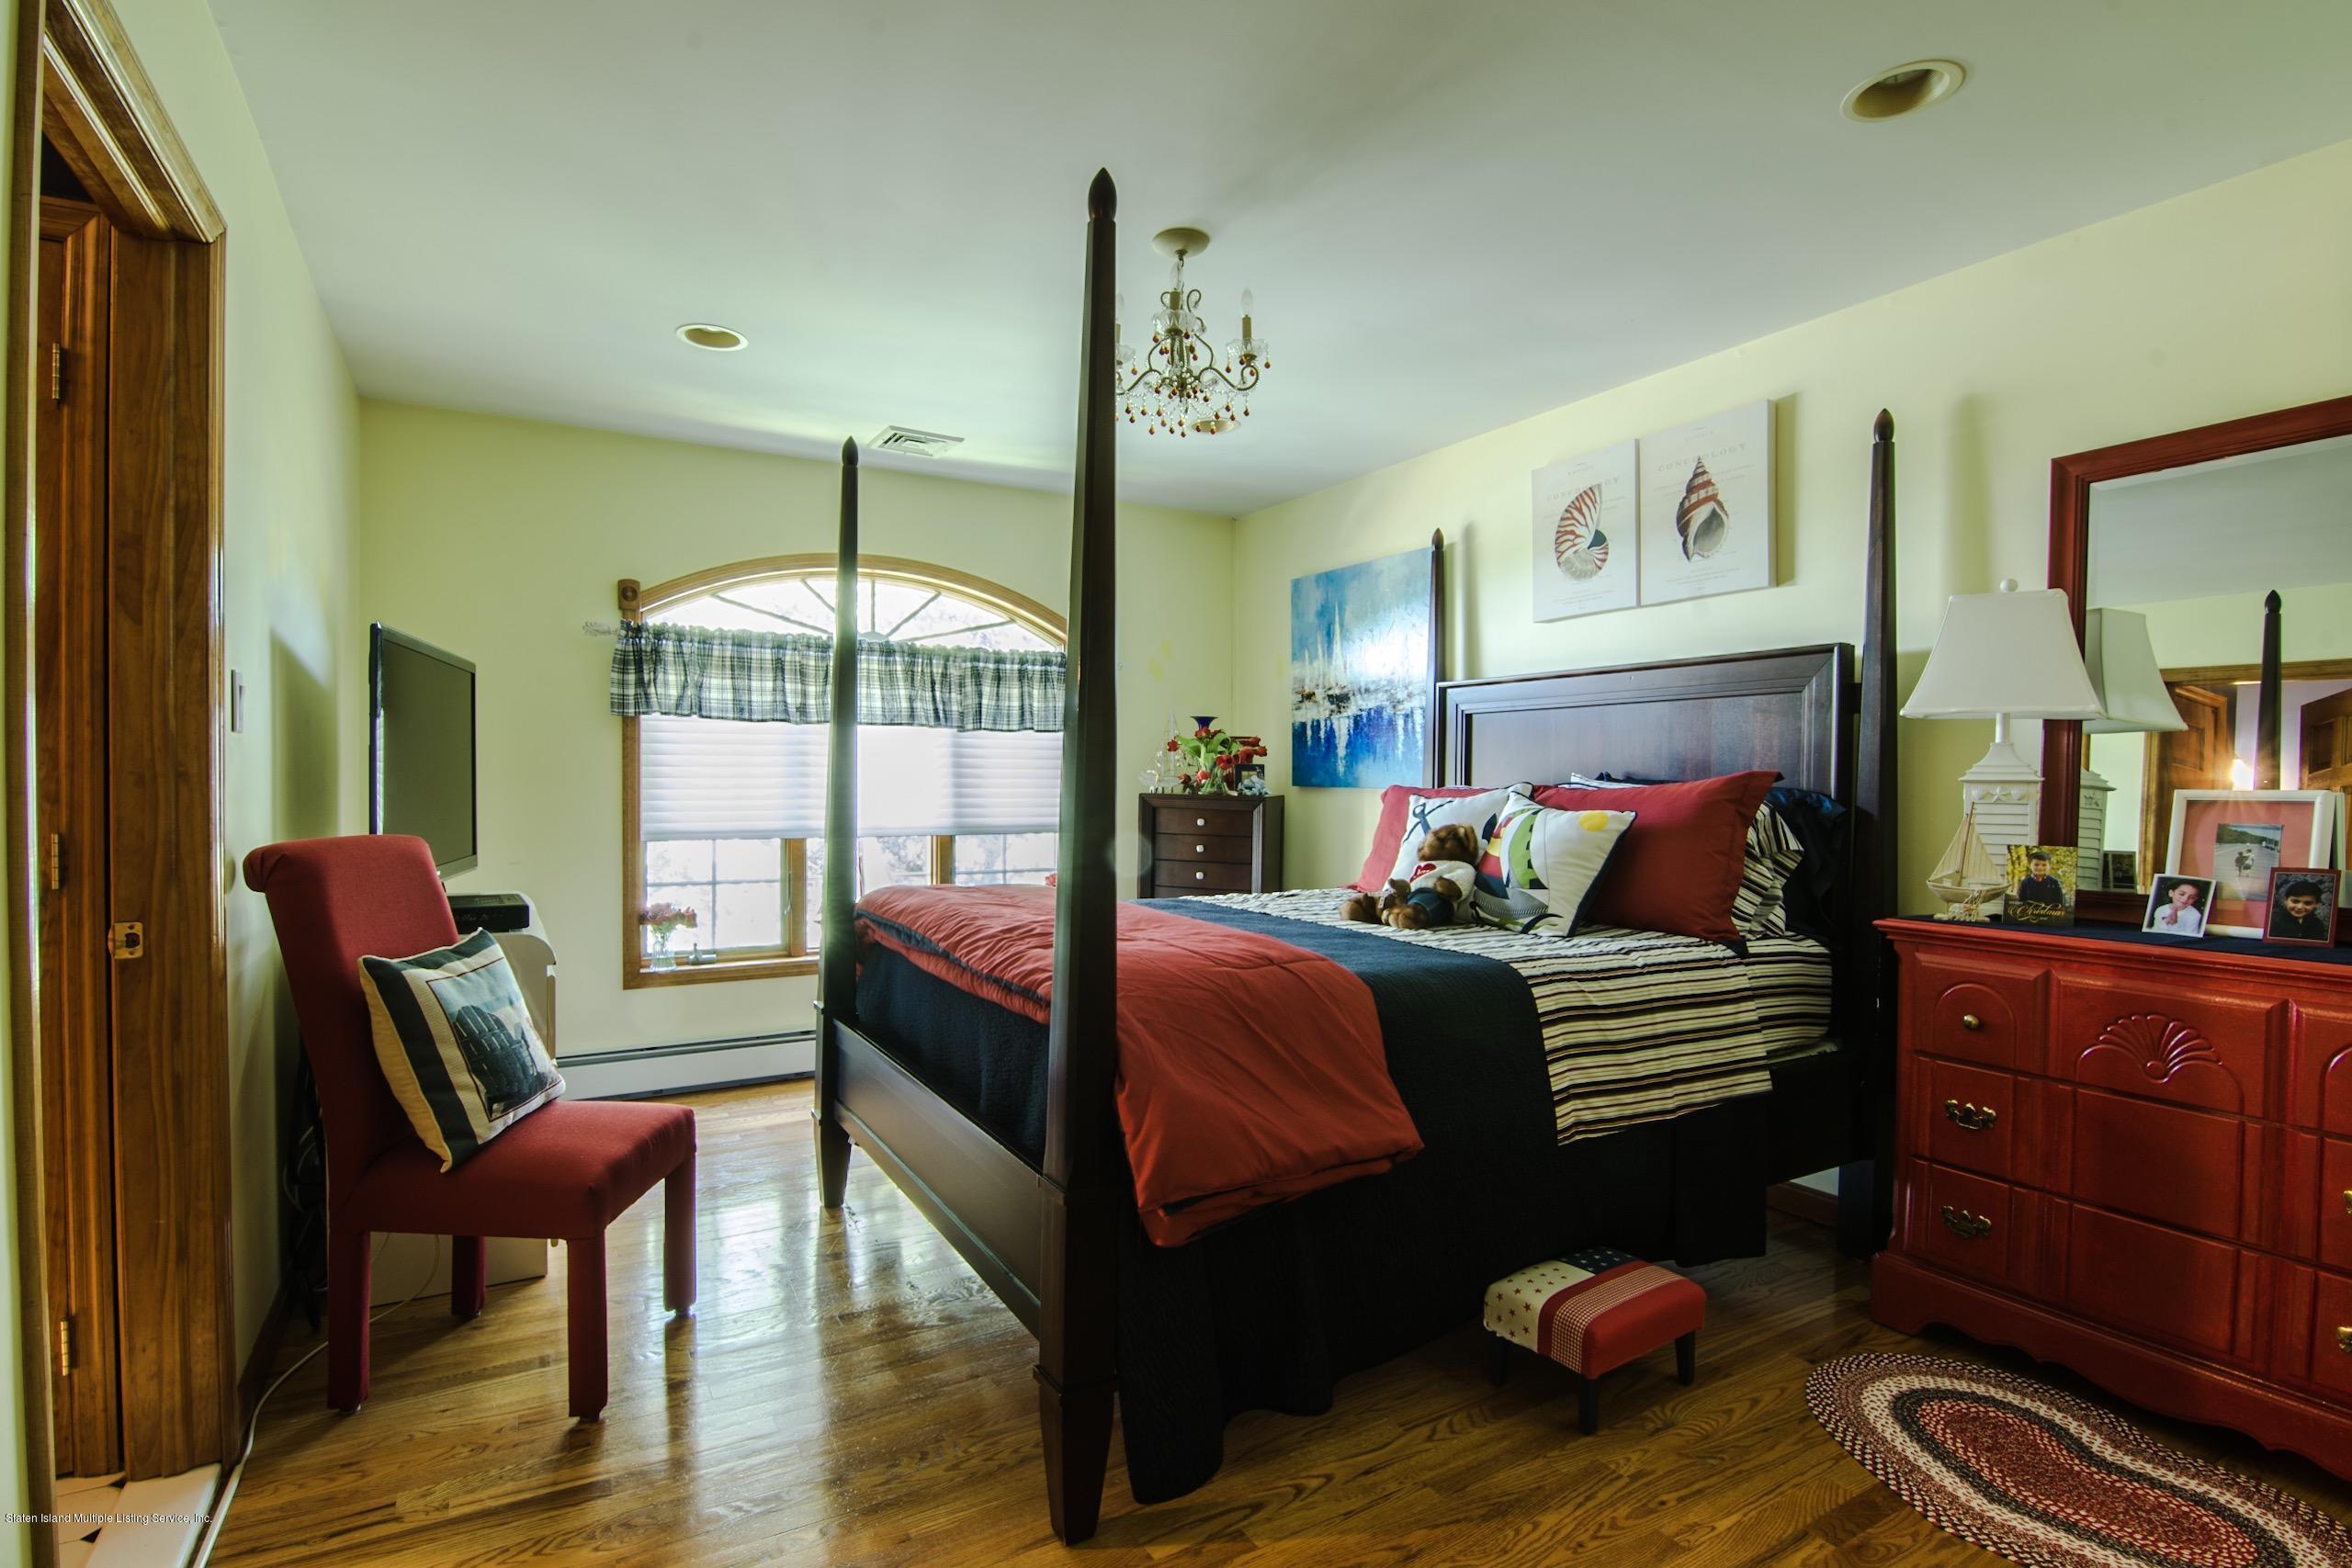 Single Family - Detached 120 Milden Avenue  Staten Island, NY 10301, MLS-1121068-16